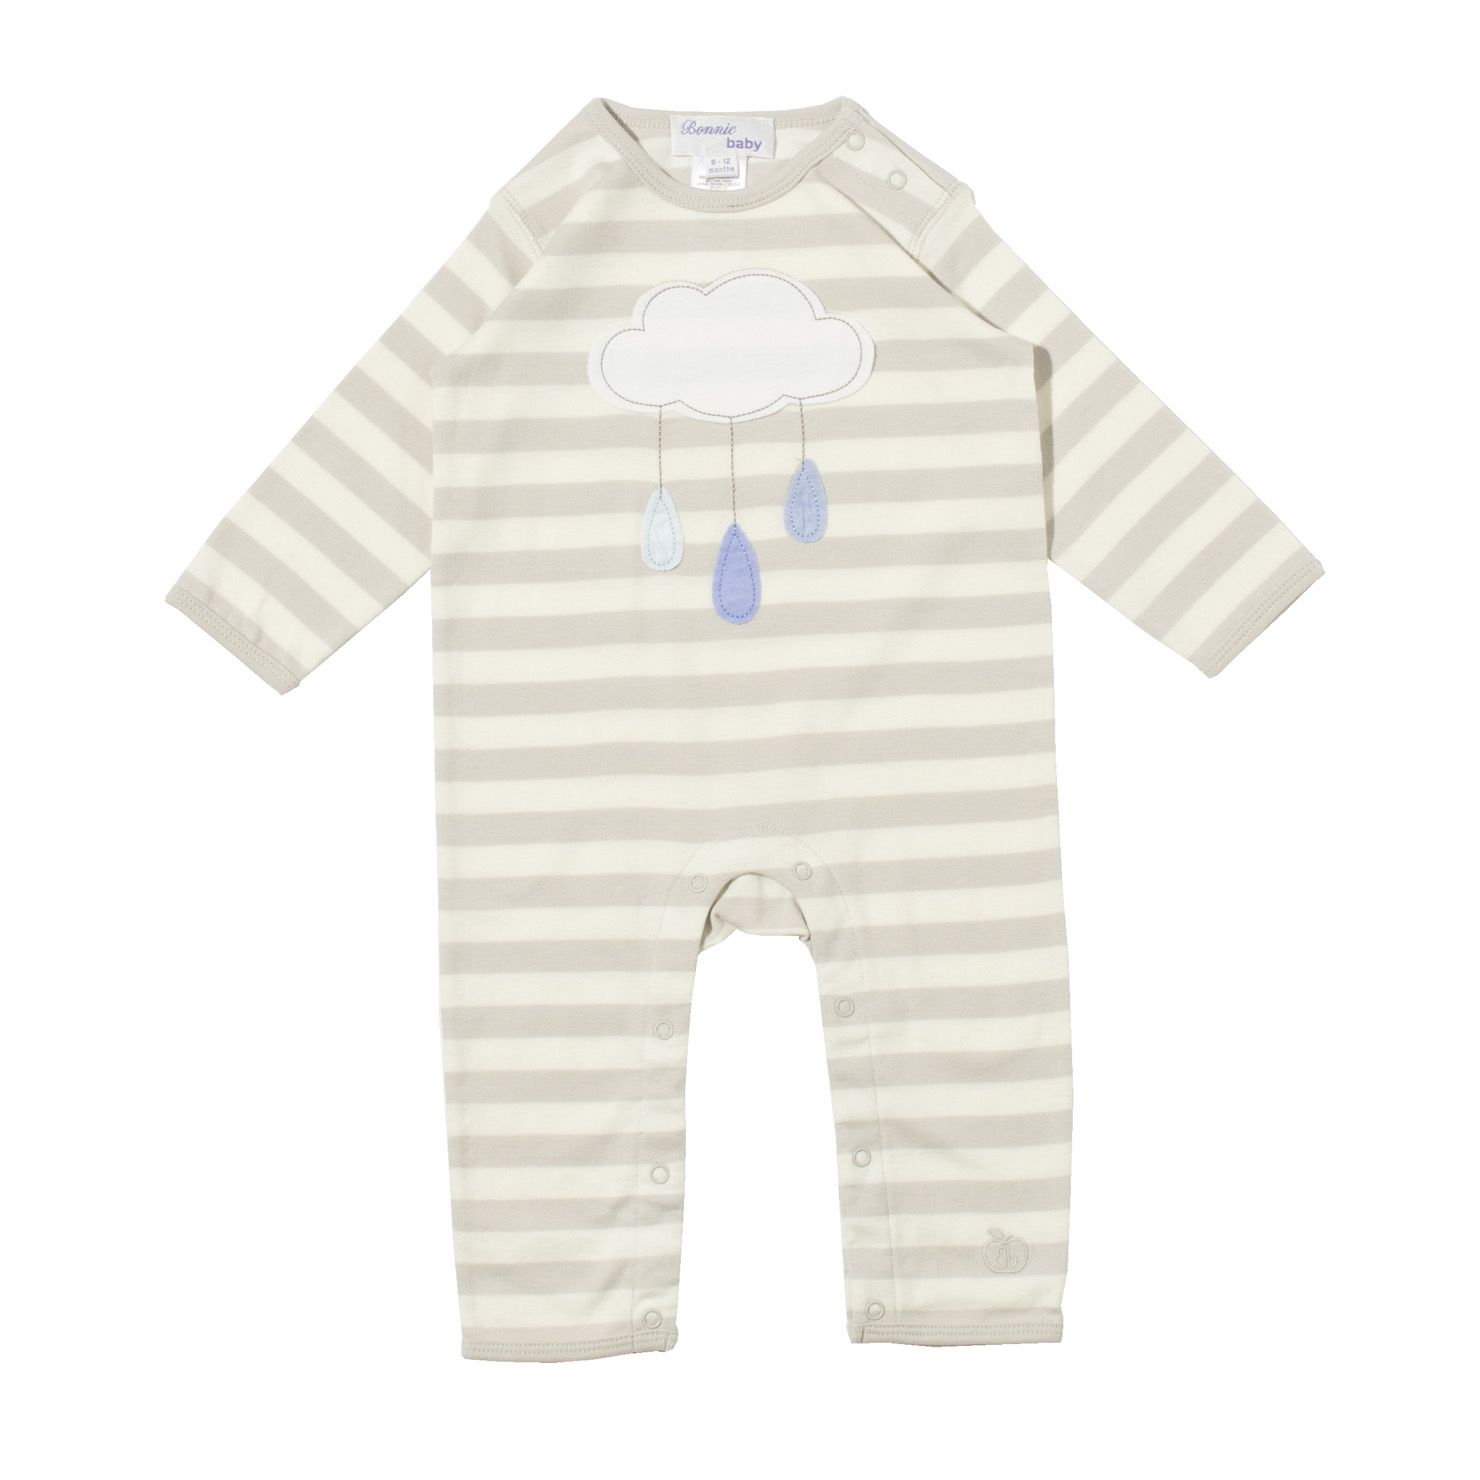 Bonnie Baby Rainy Cloud Applique Playsuit - Pearlgrey & Cream